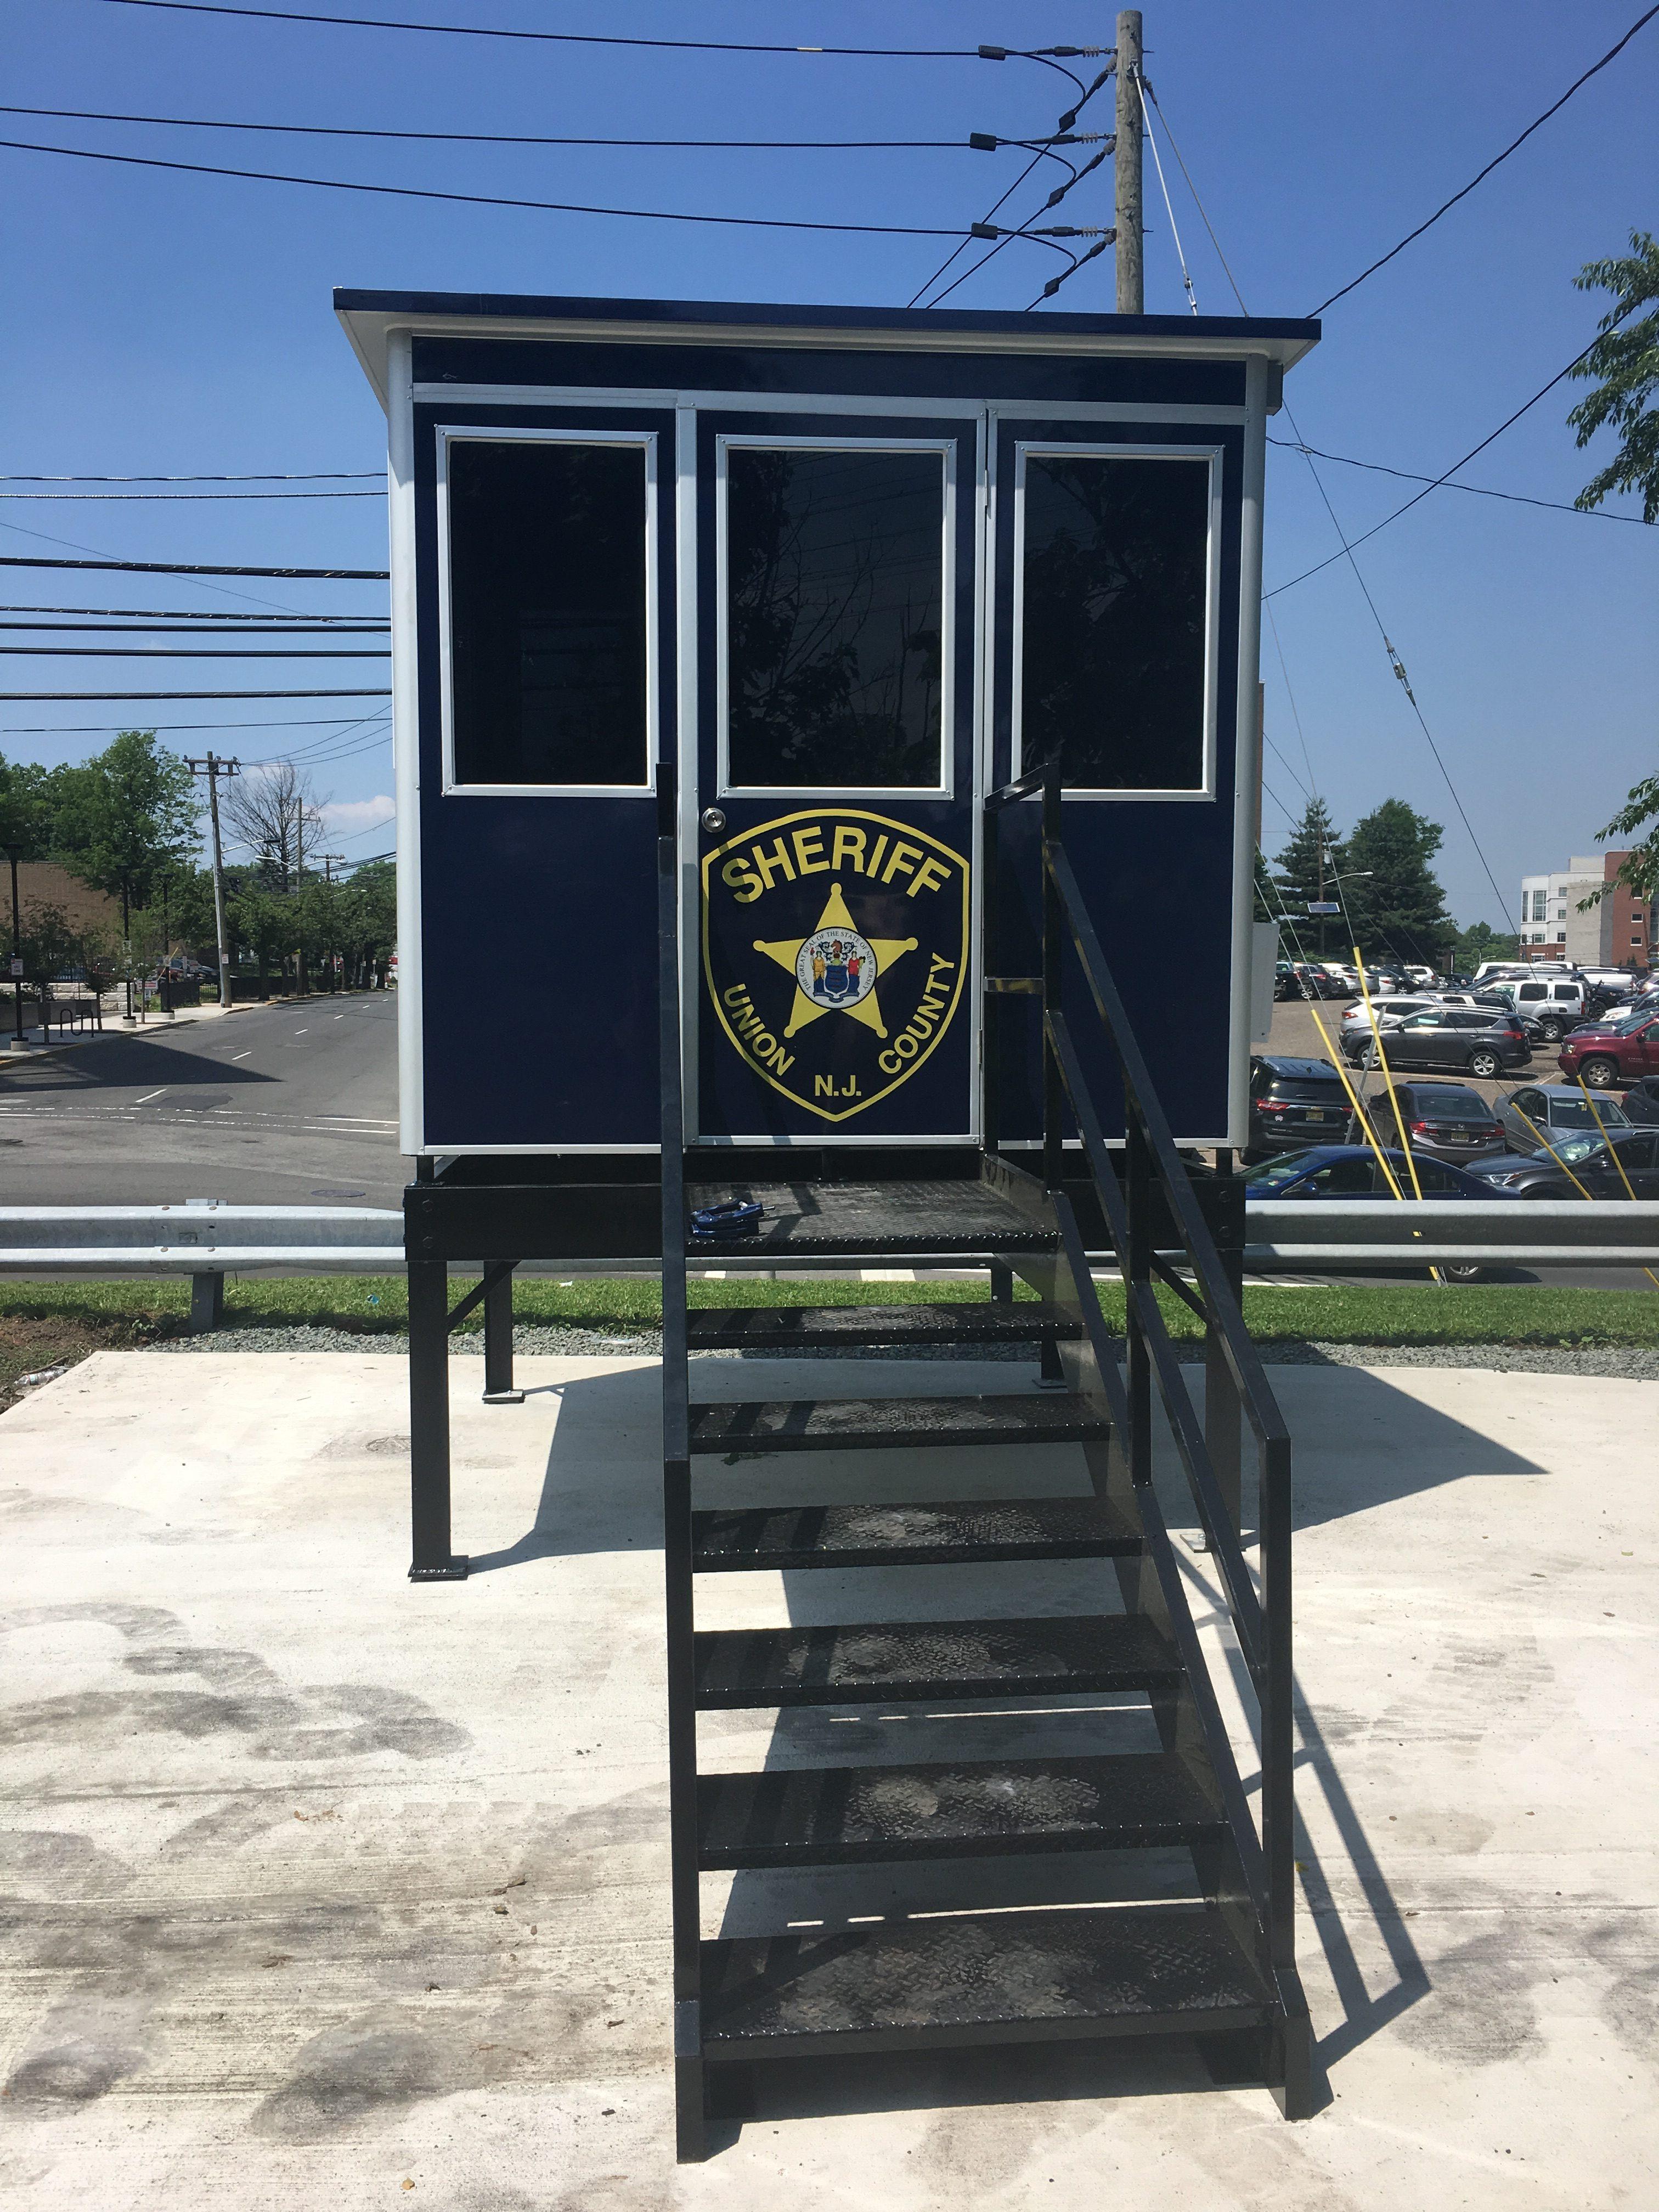 8x8 Security Guard Booth in Elizabeth, NJ with Mezzanine, Swing Door, Custom Exterior Color, and Breaker Panel Box